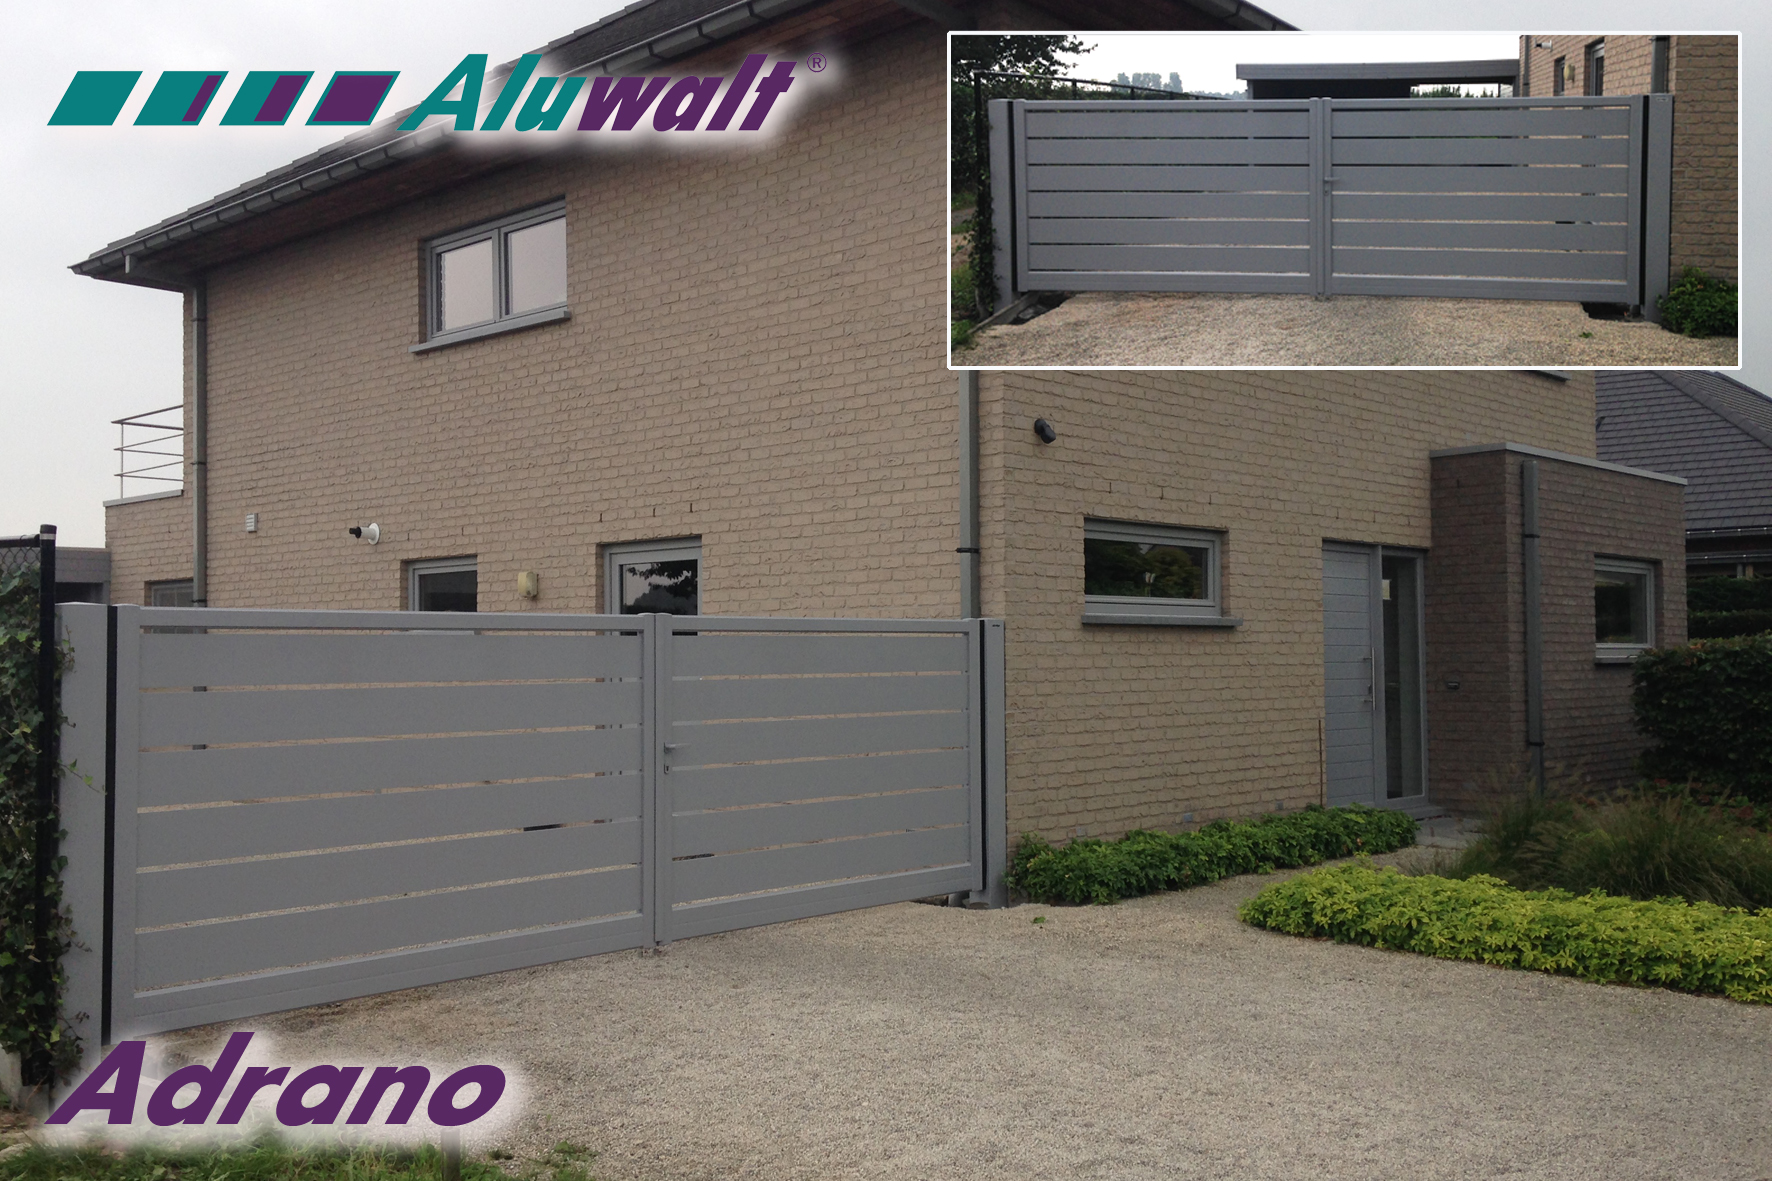 Adrano43